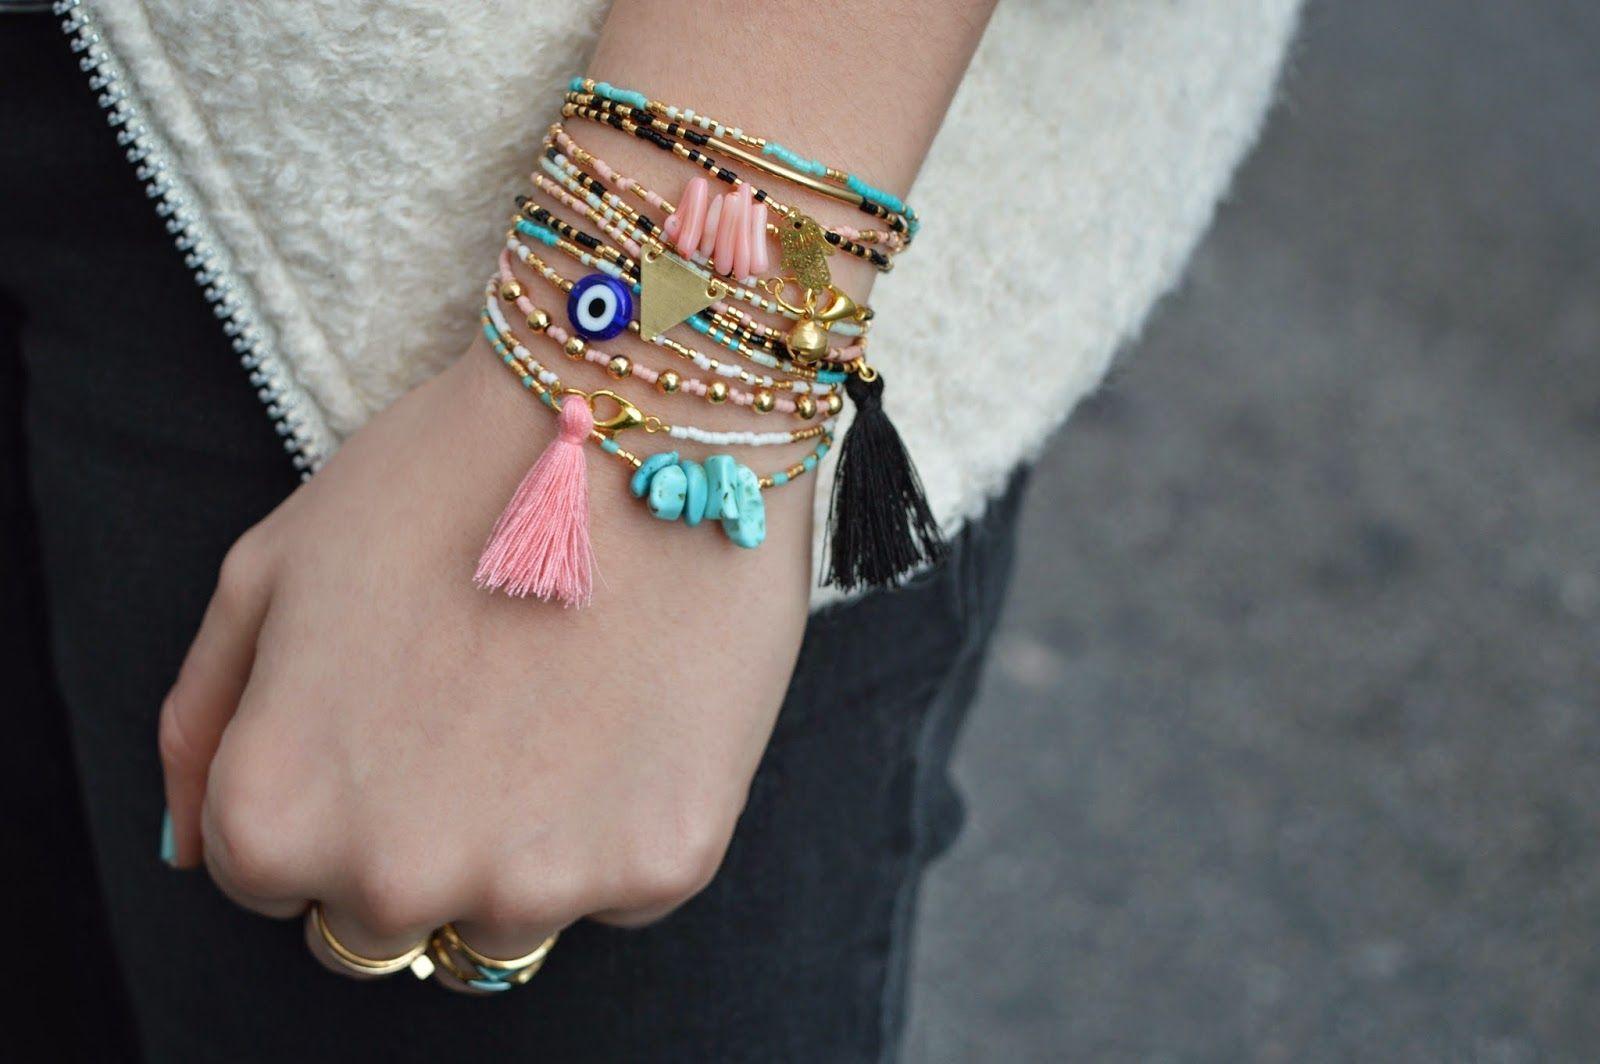 diy bracelets fins en perles miyuki perles de rocaille rocaille et bracelets. Black Bedroom Furniture Sets. Home Design Ideas